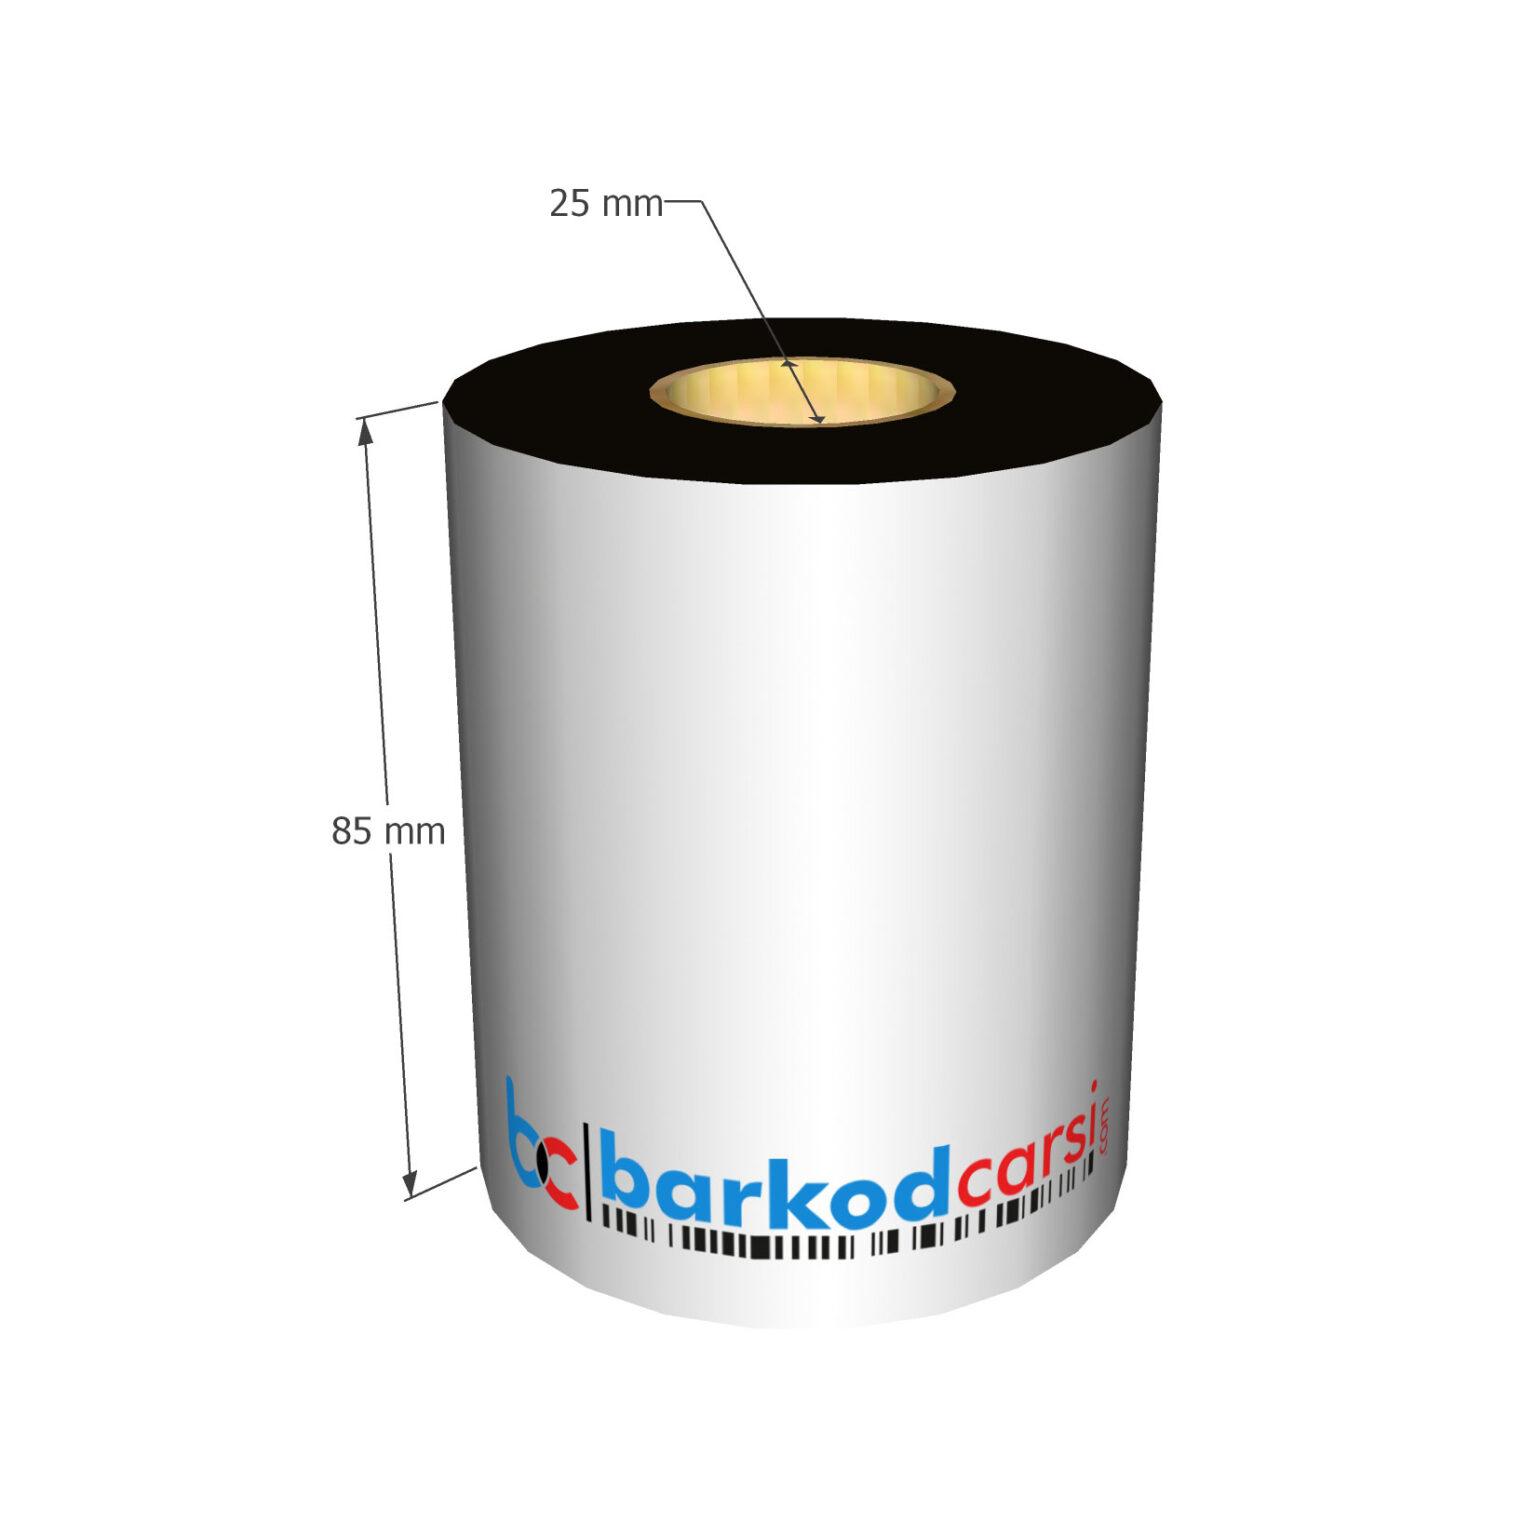 85x300 mt Wax / Wax-Resin / Resin / Hot-Foil Ribon Çeşitleri By BarkodCarsi.com